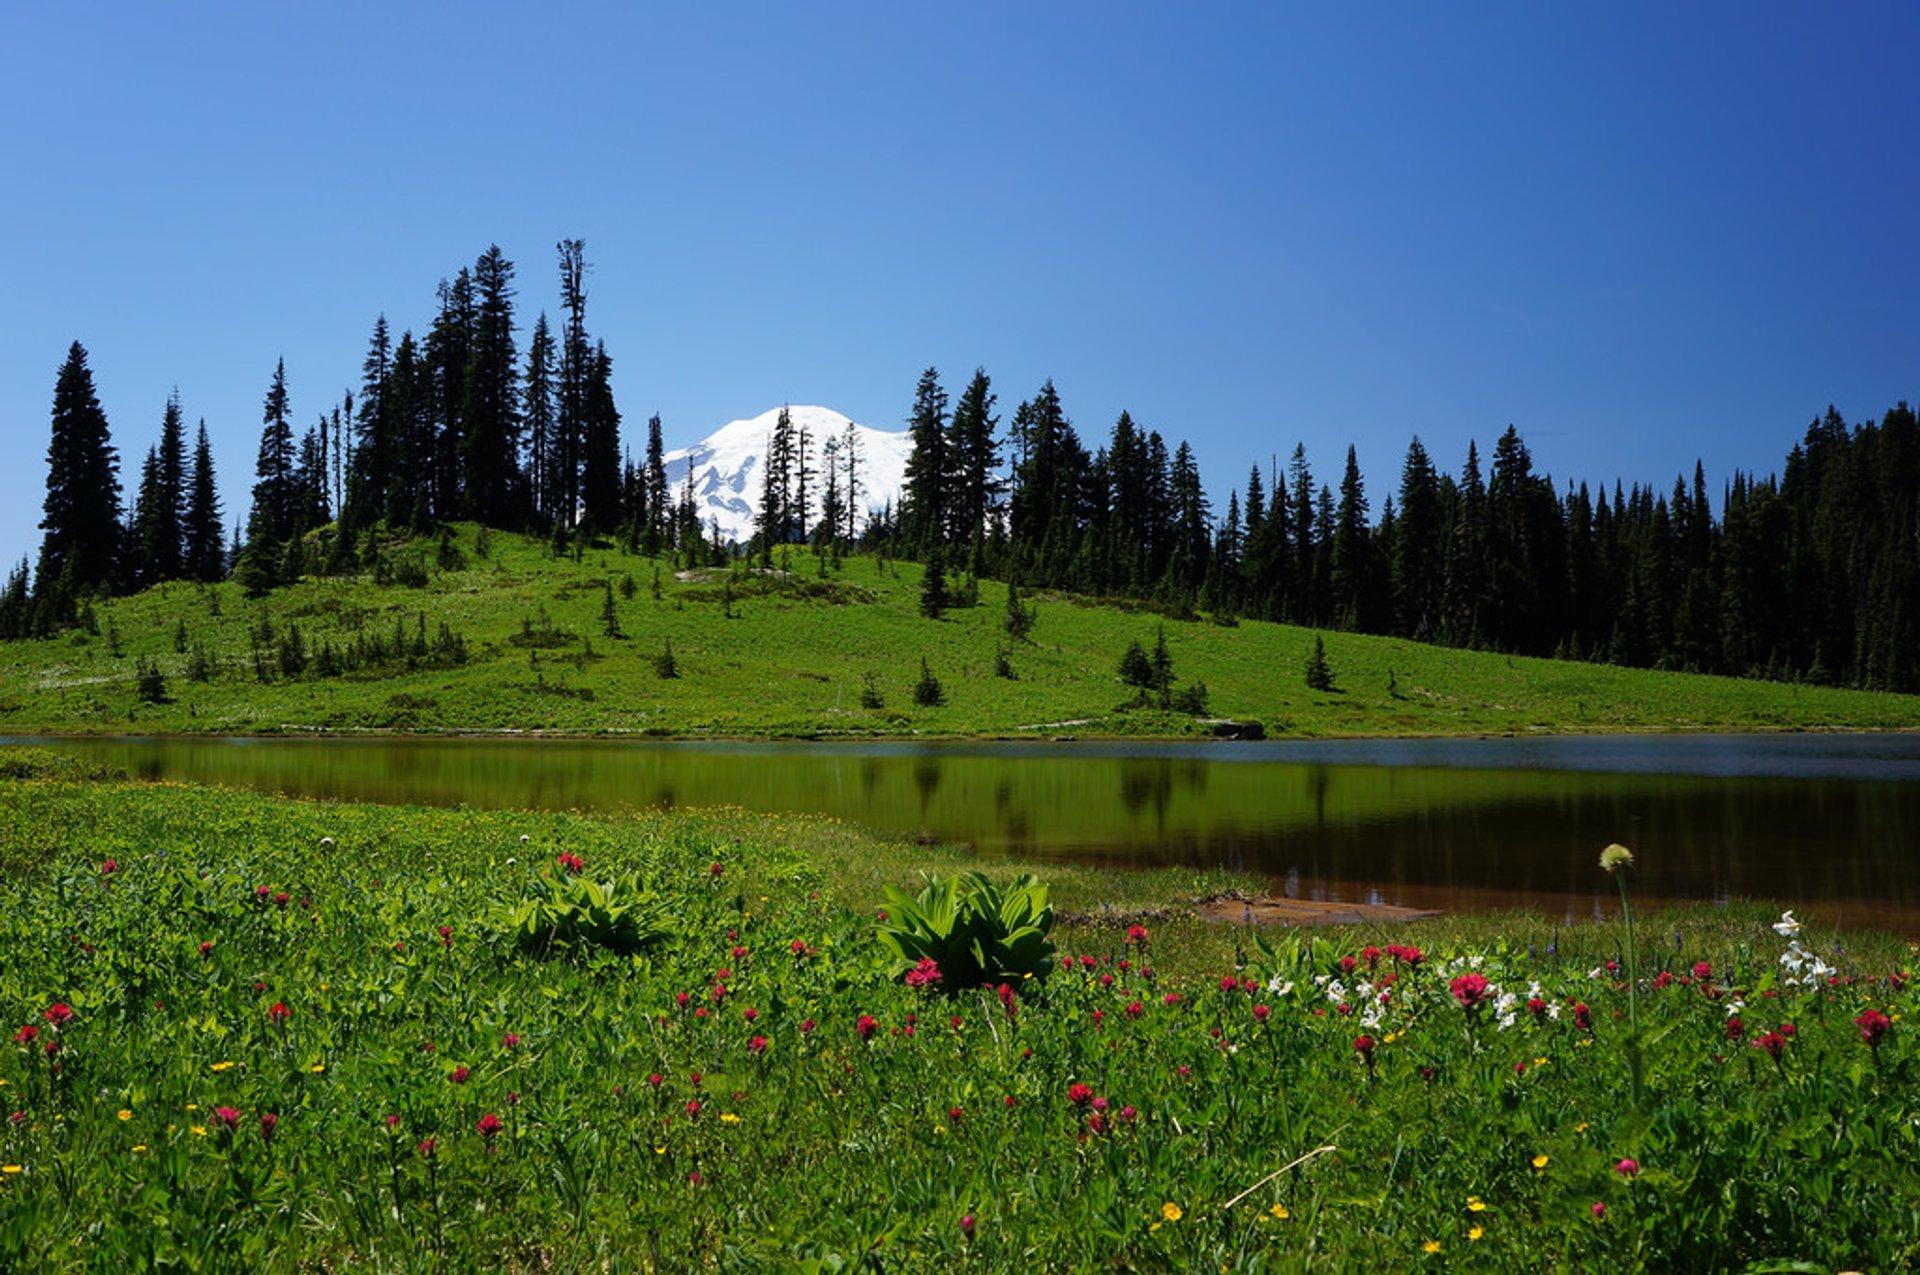 Alpine meadow at Tipsoo Lake 2020